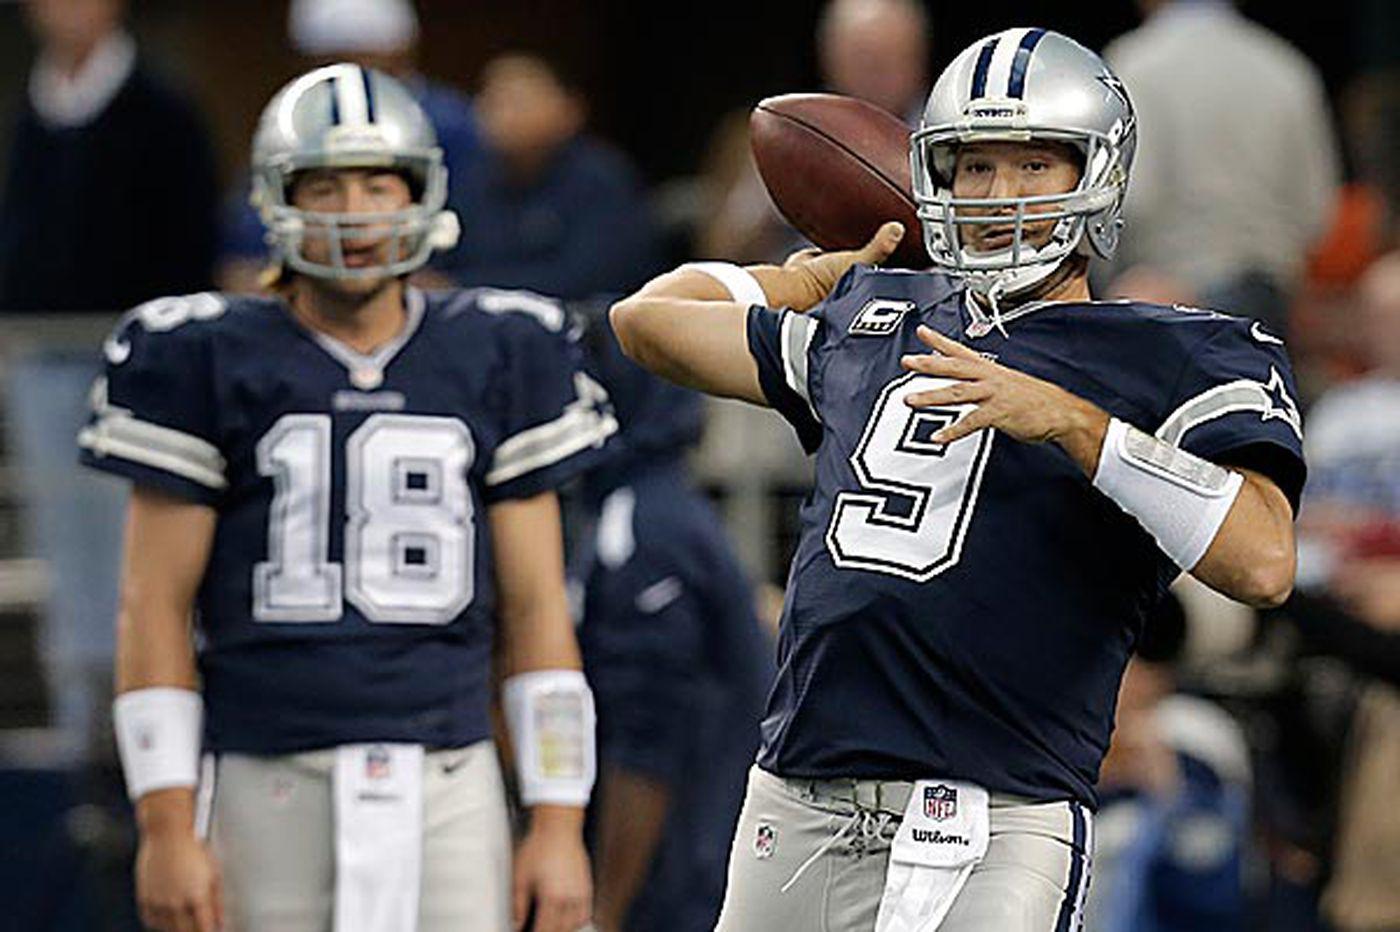 Amid Romo aftershocks, Eagles prepare to face Cowboys